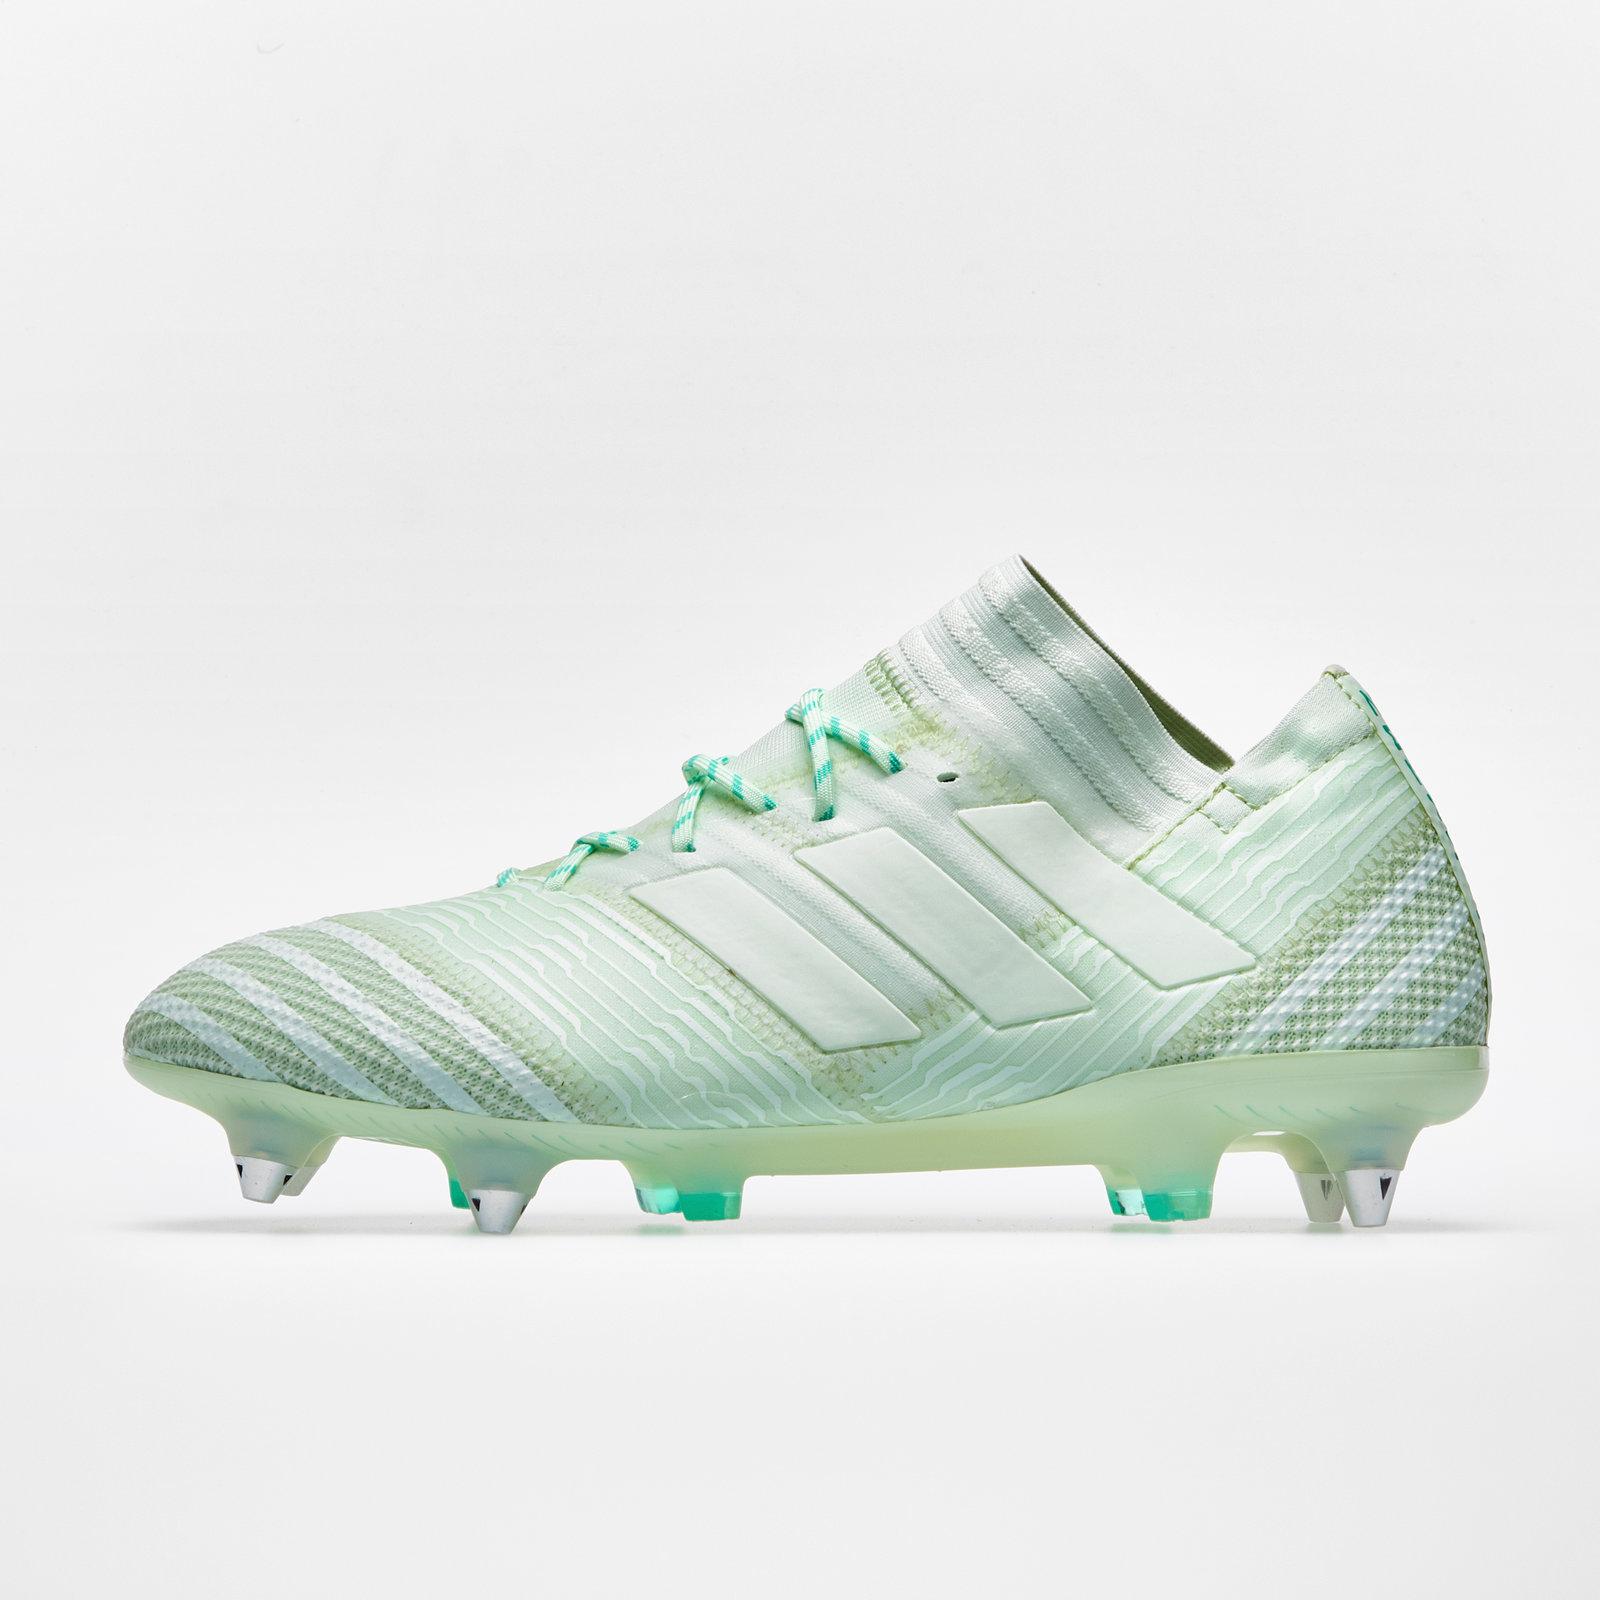 542f870a6206 adidas Mens Nemeziz 17.1 Soft Ground Football Boots Studs Trainers Shoes  Green